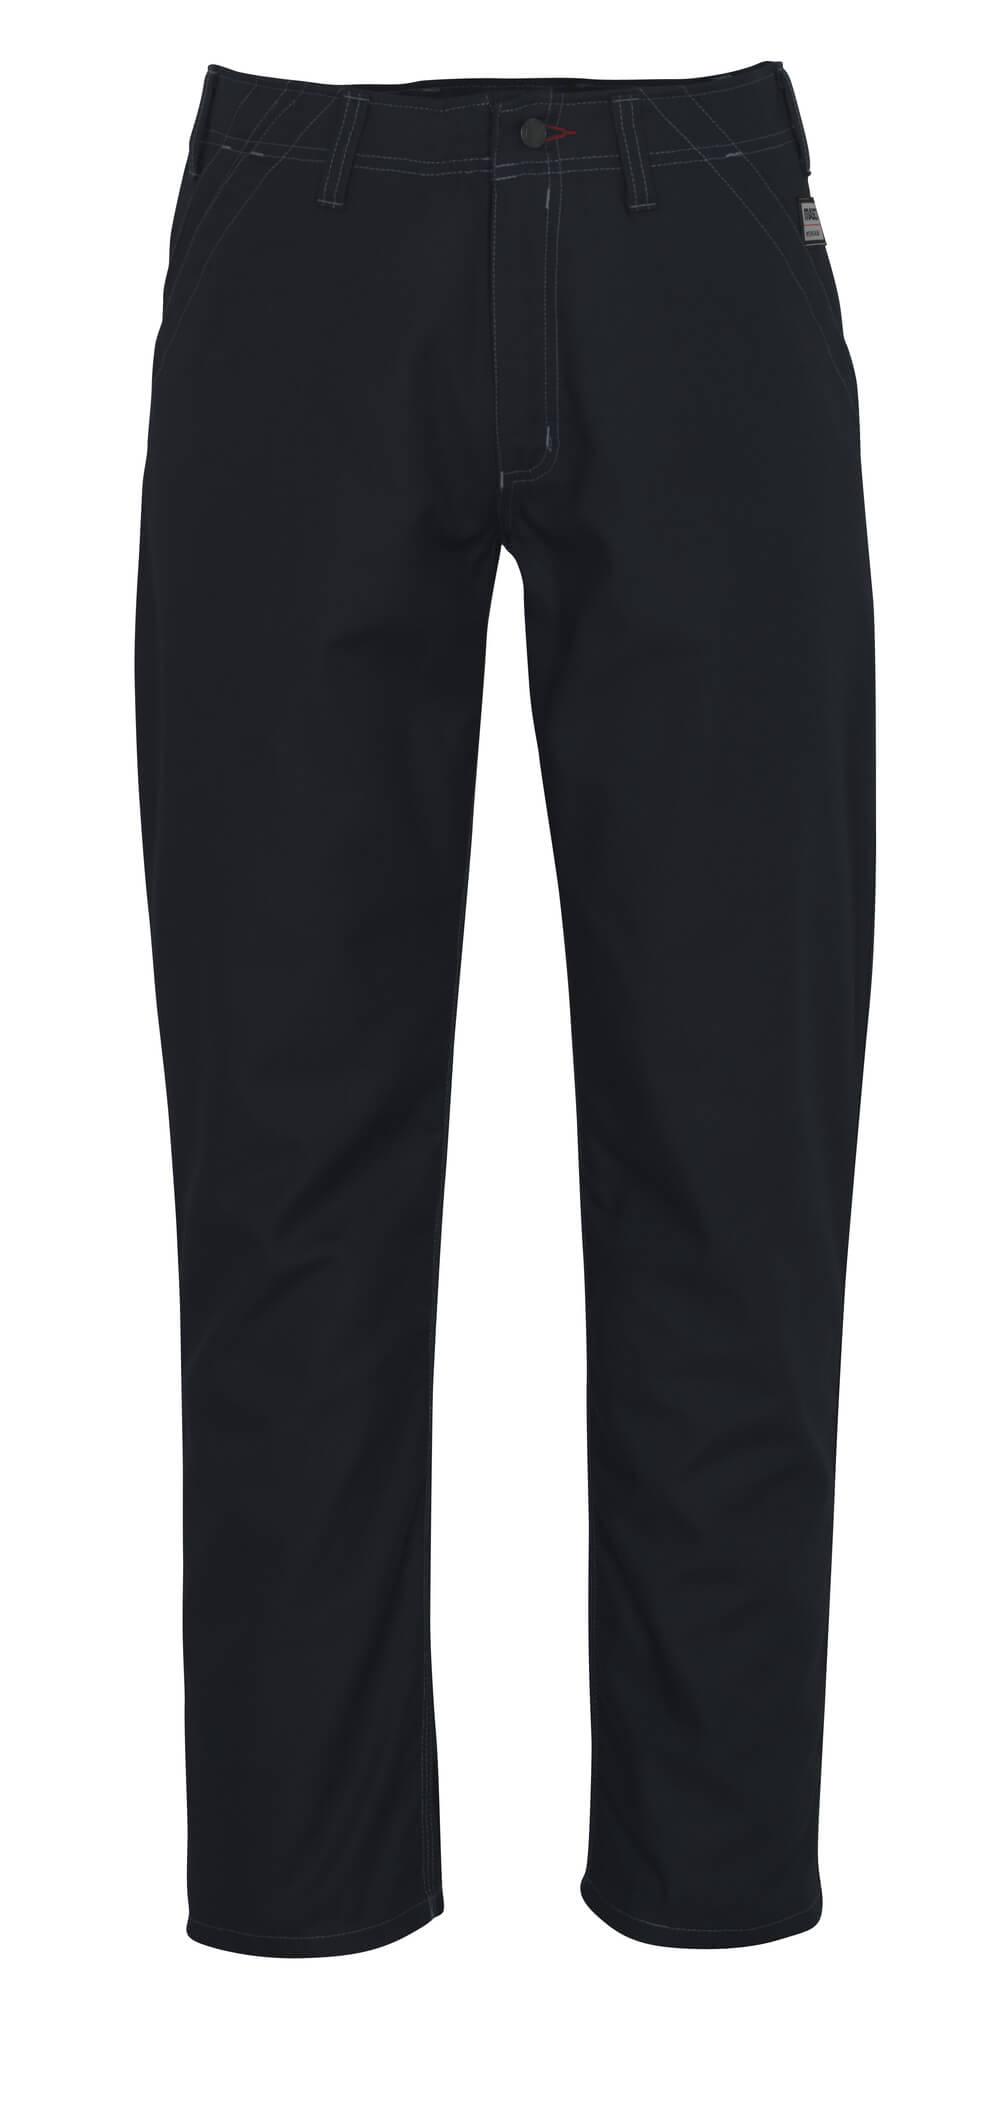 09279-154-010 Pants - dark navy